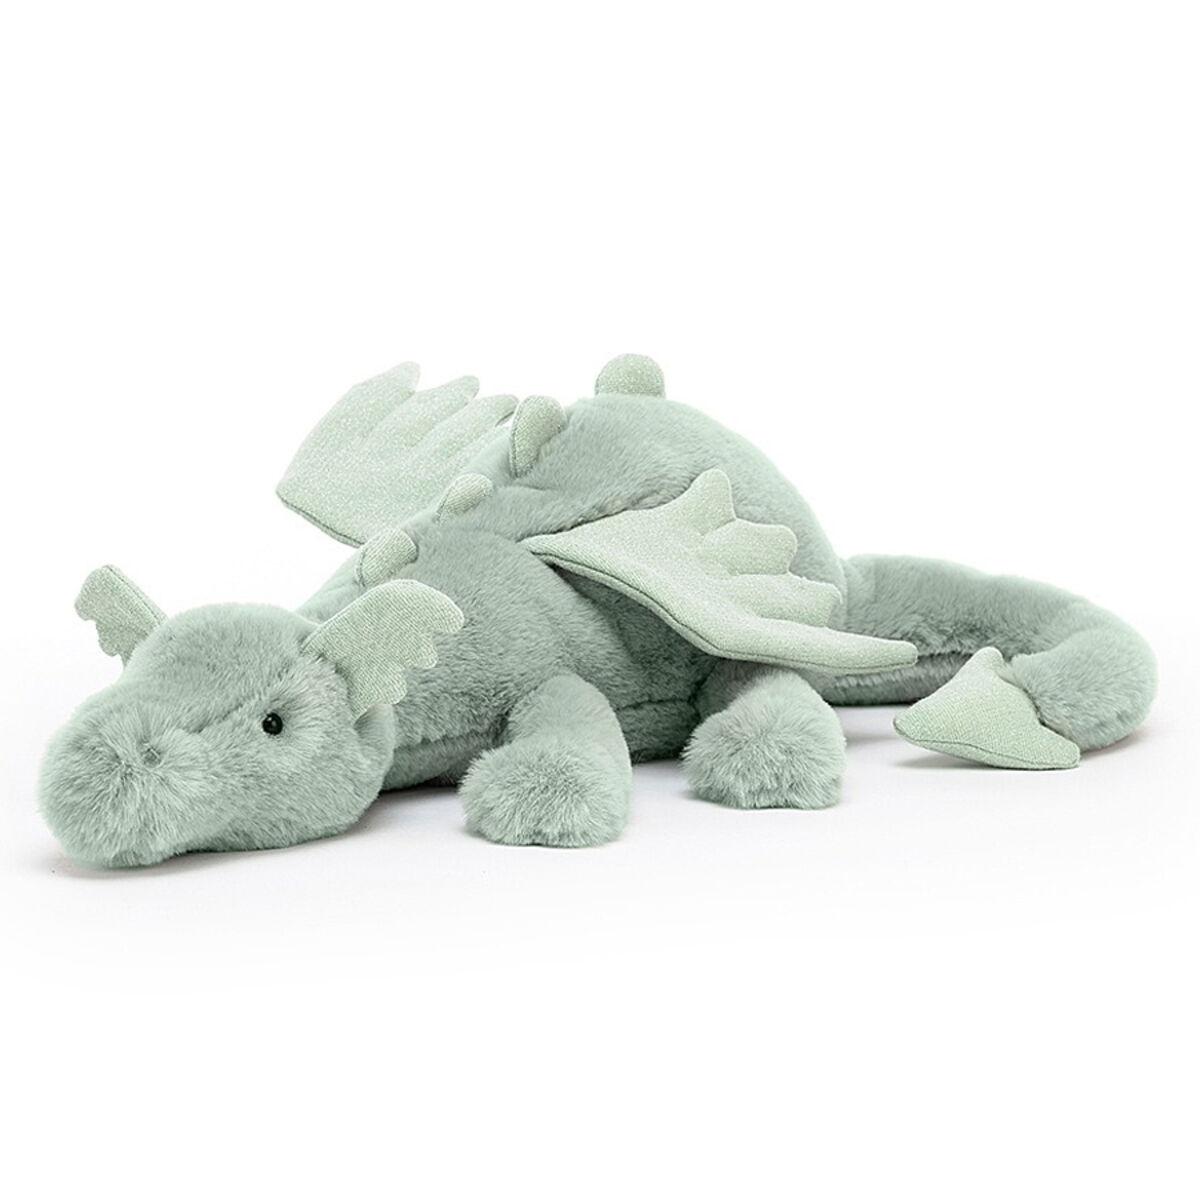 Jellycat Sage Dragon - Medium